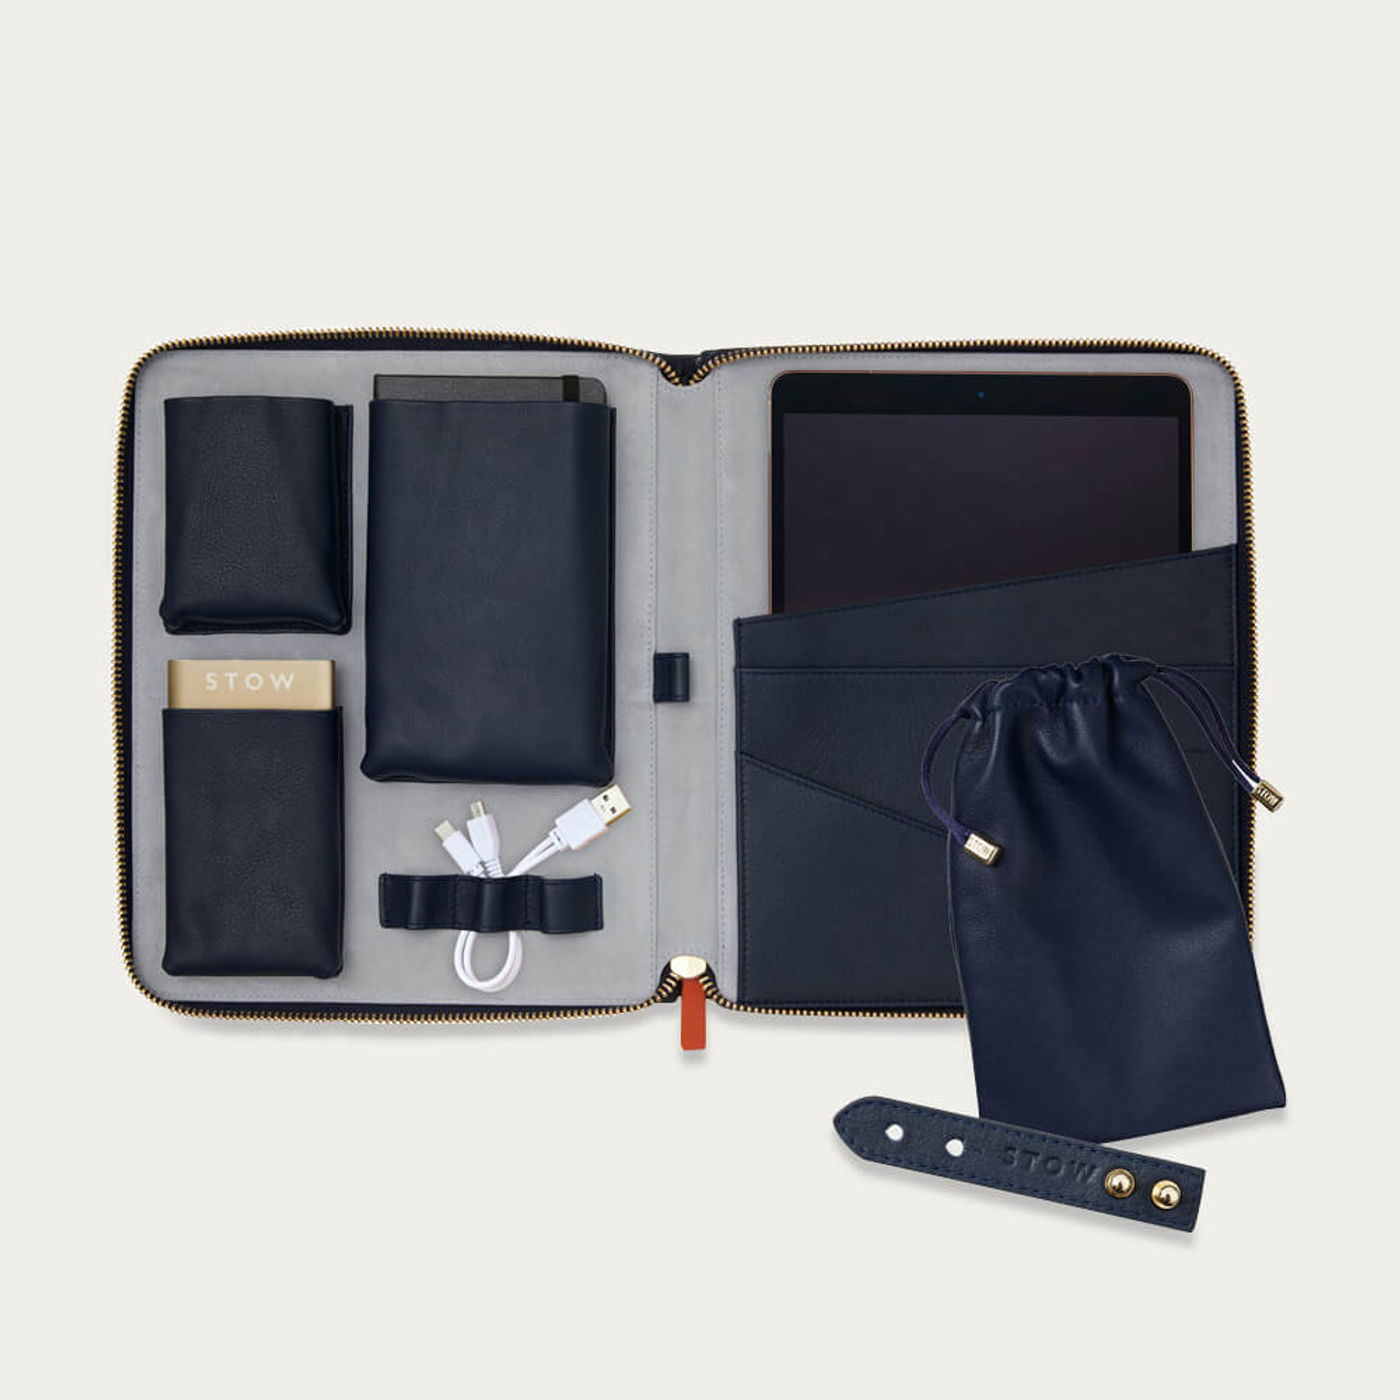 Sapphire Blue & Pale Grey The World Class Leather Tech Set | Bombinate